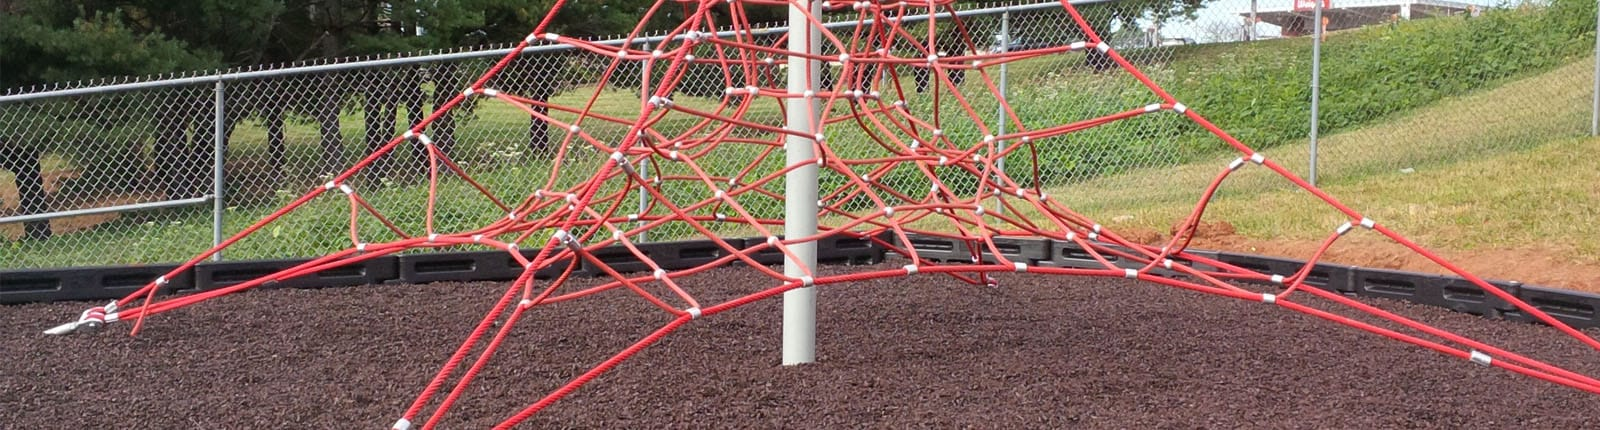 Modular Play Playground Equipment | Sterling West